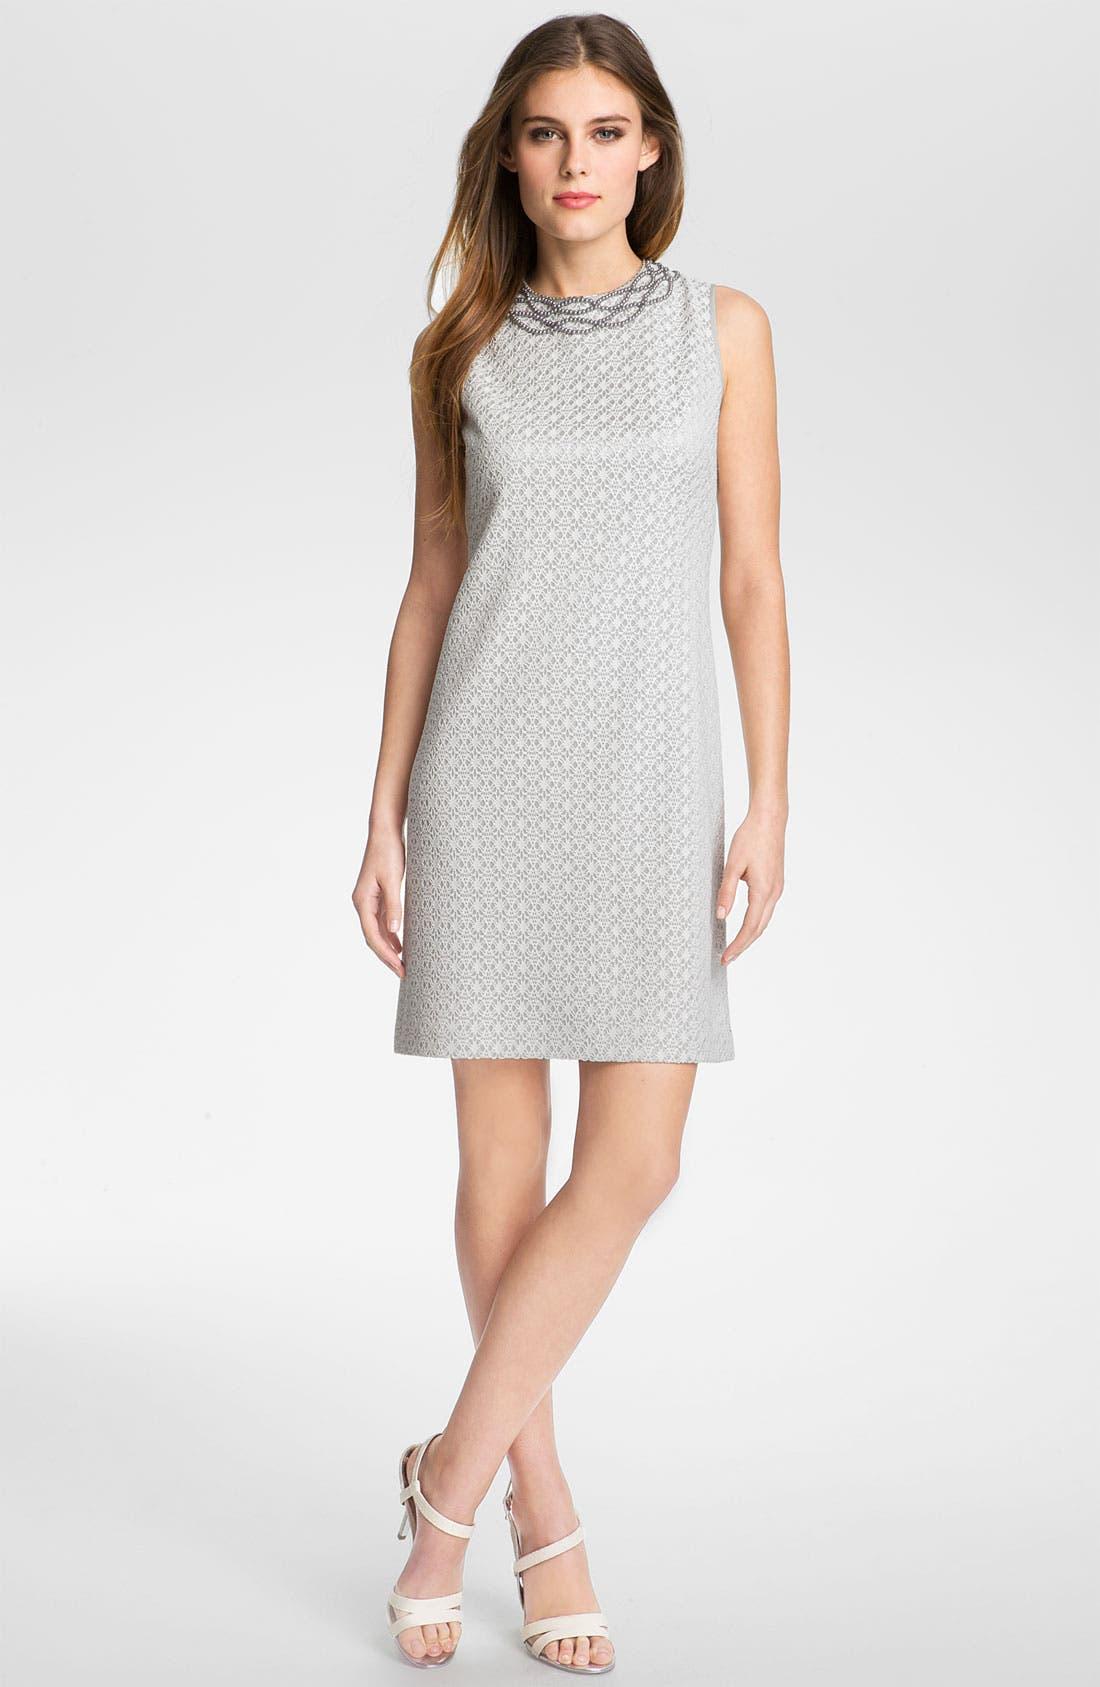 Main Image - Adrianna Papell Embellished Lace Shift Dress (Plus)